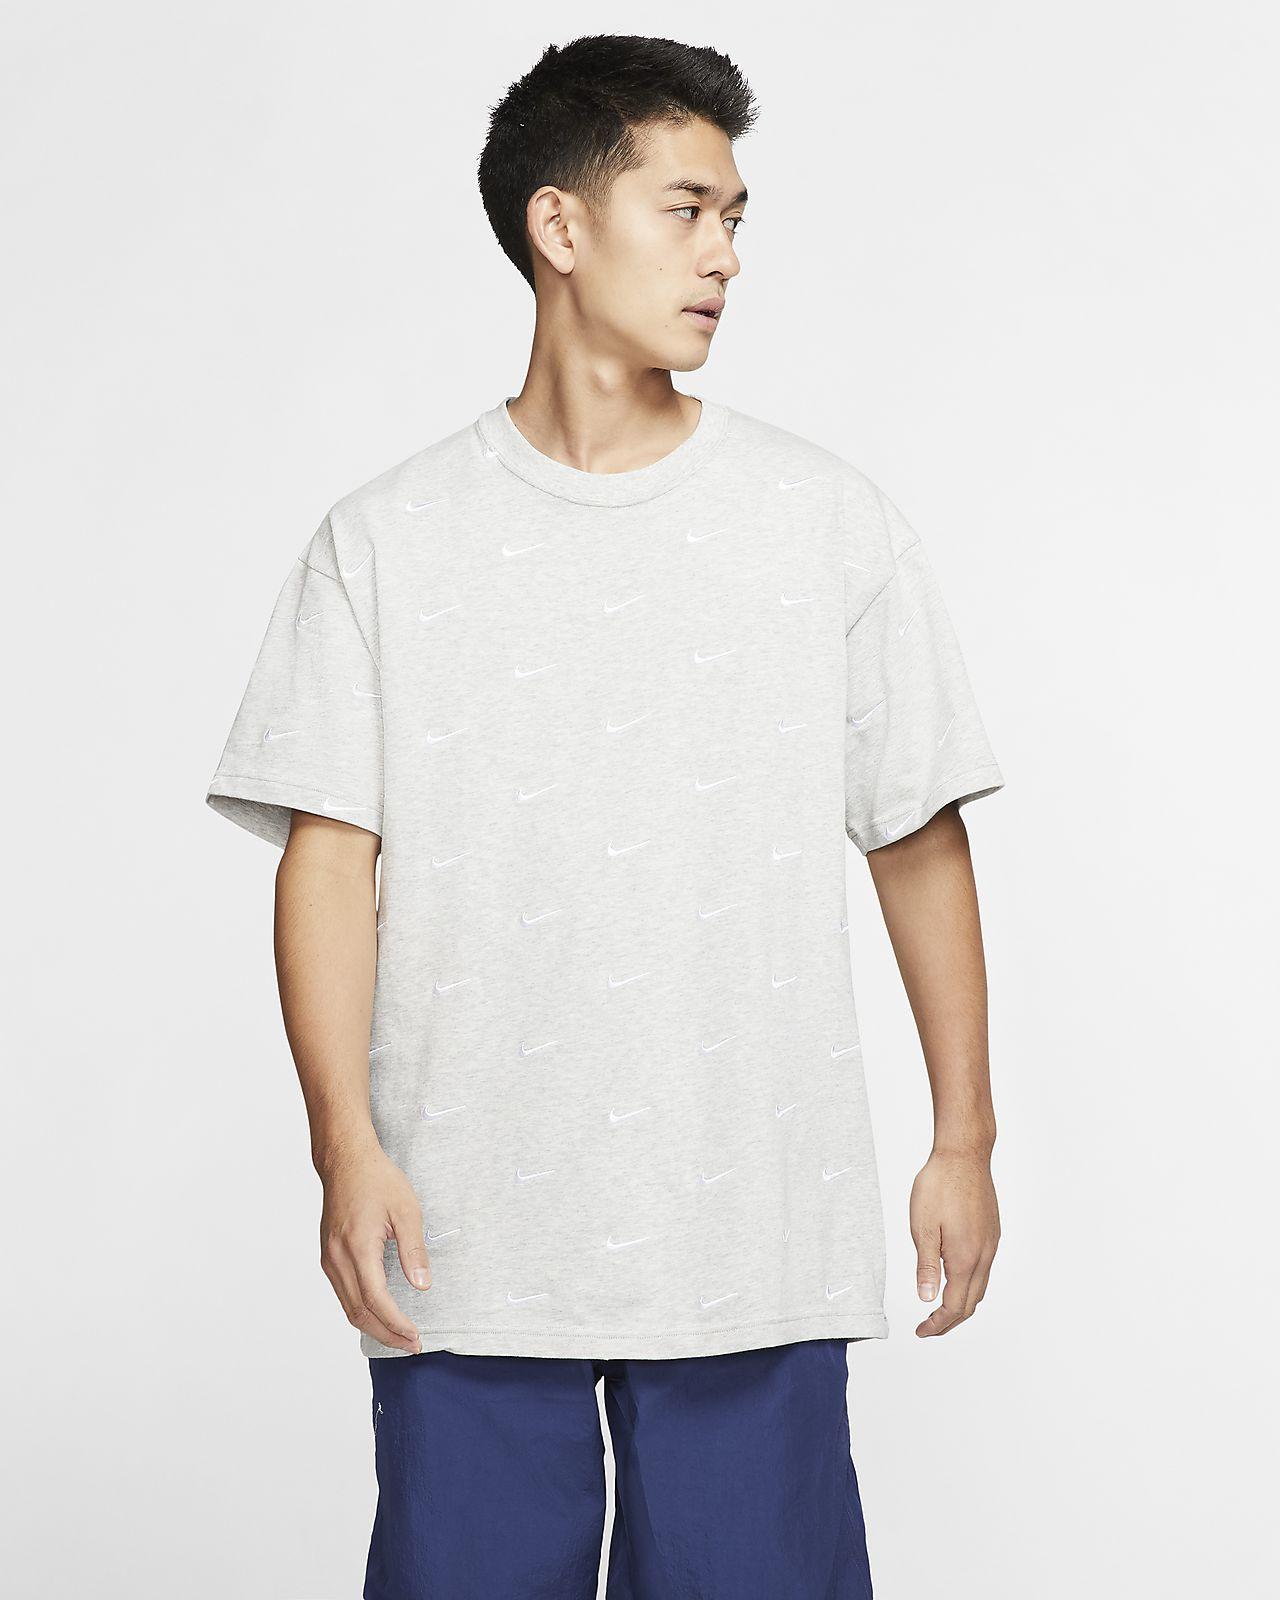 Nike Men's Swoosh Logo T-Shirt